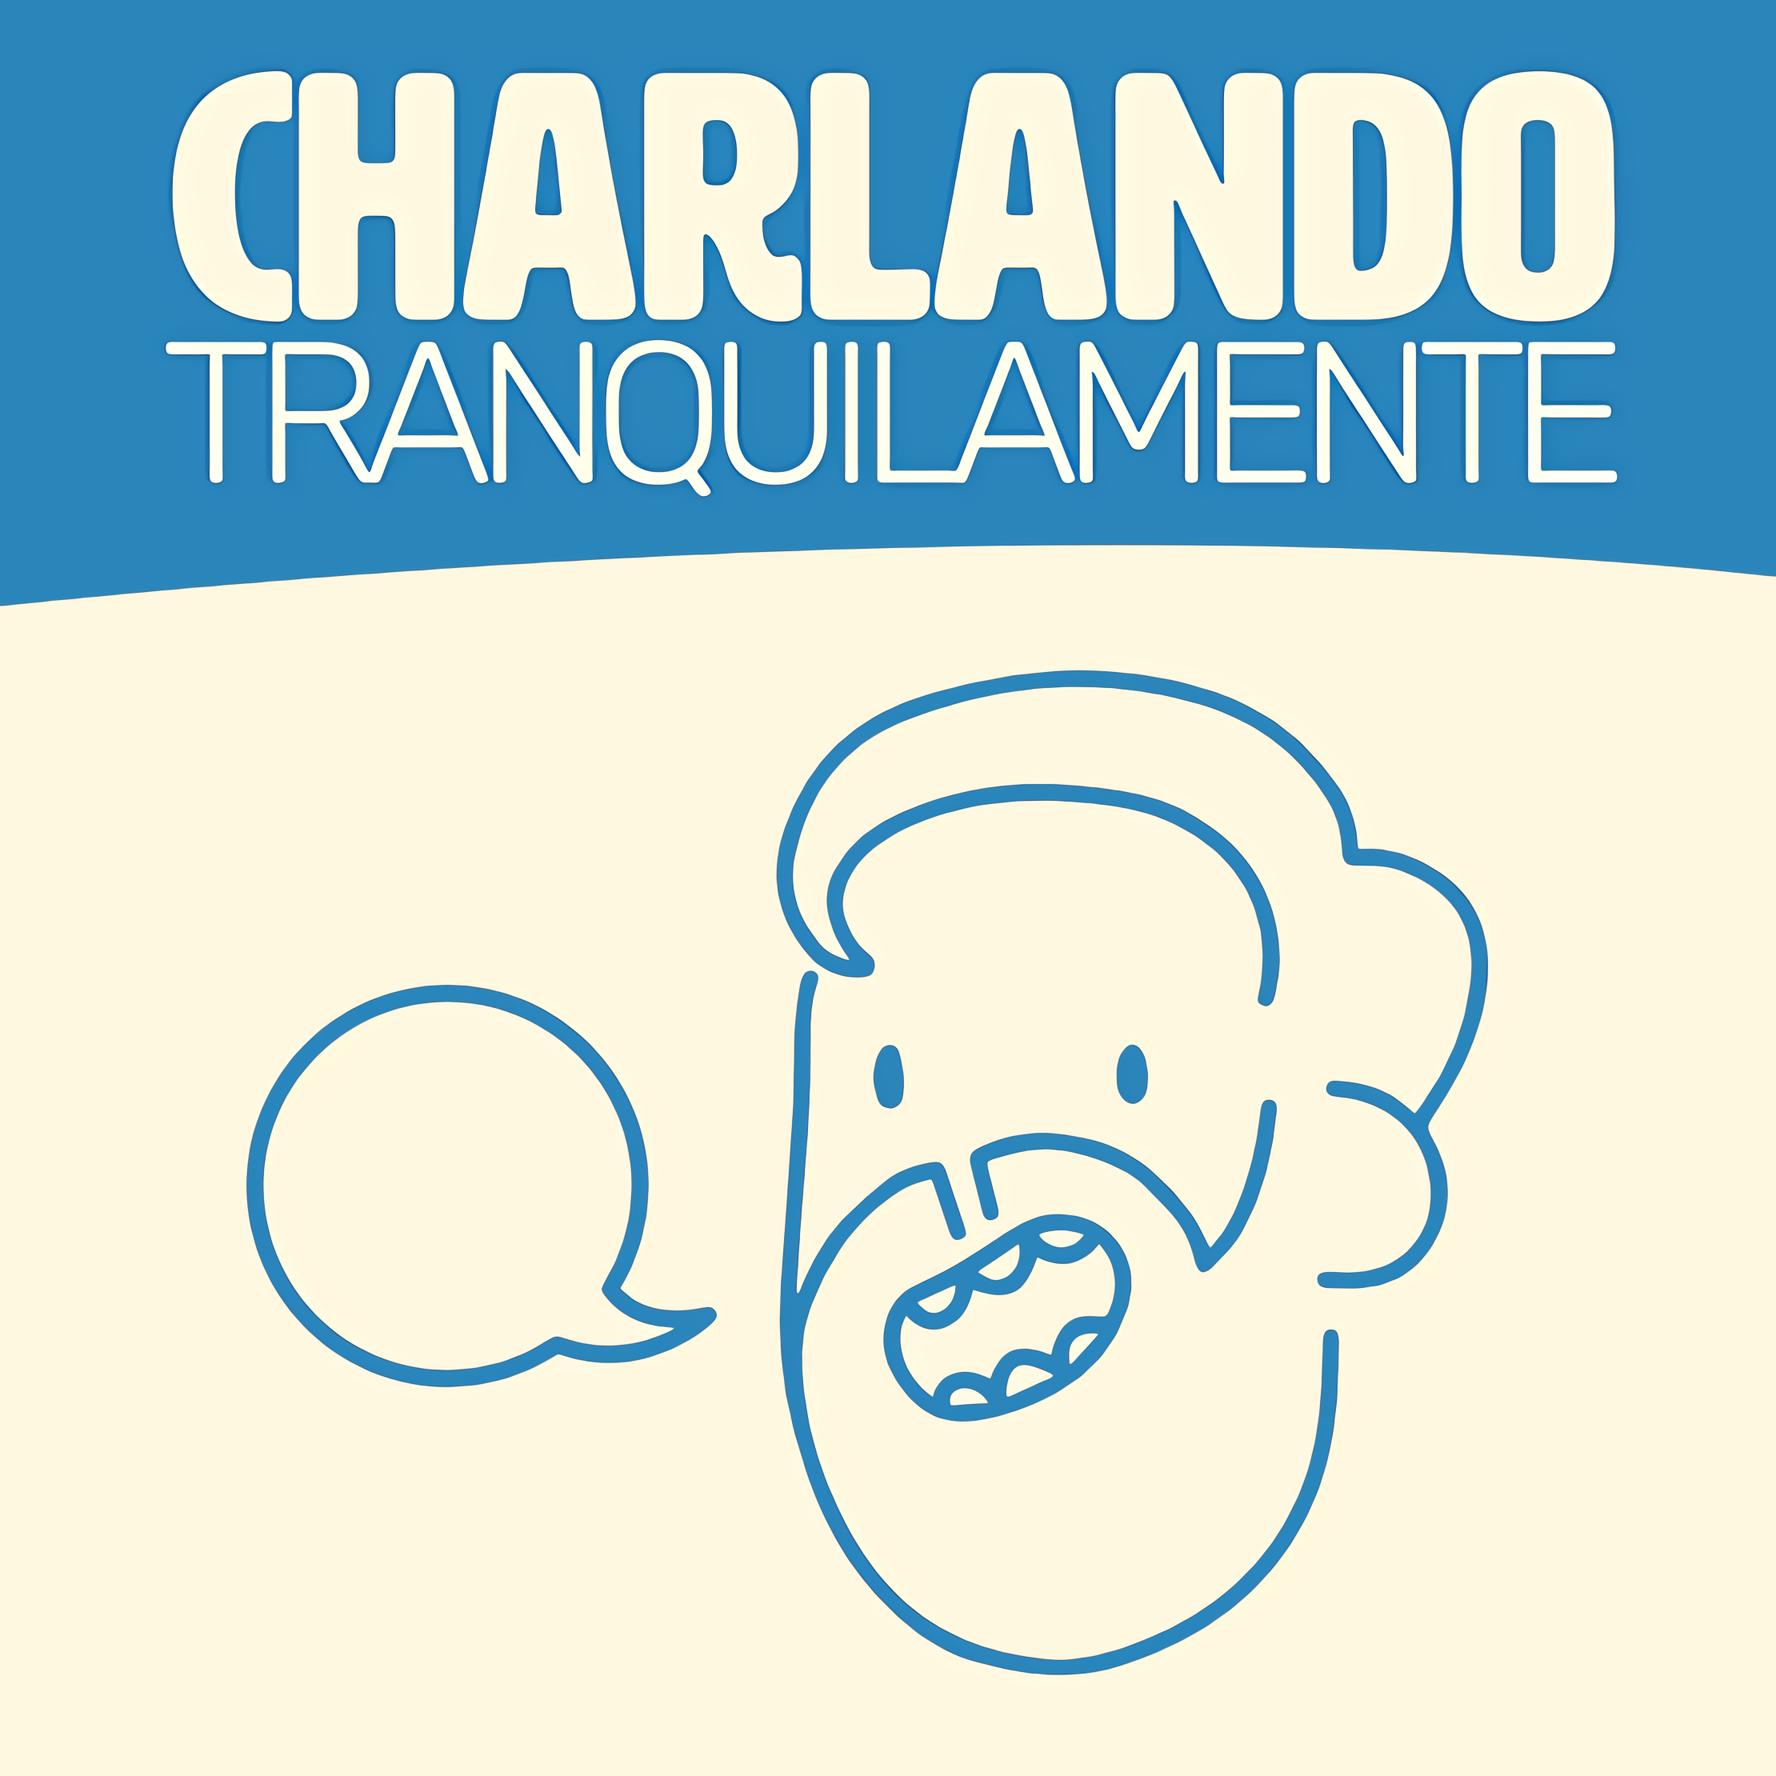 Charlando Tranquilamente #8 con JAVIER LLANOS (MI PADRE)